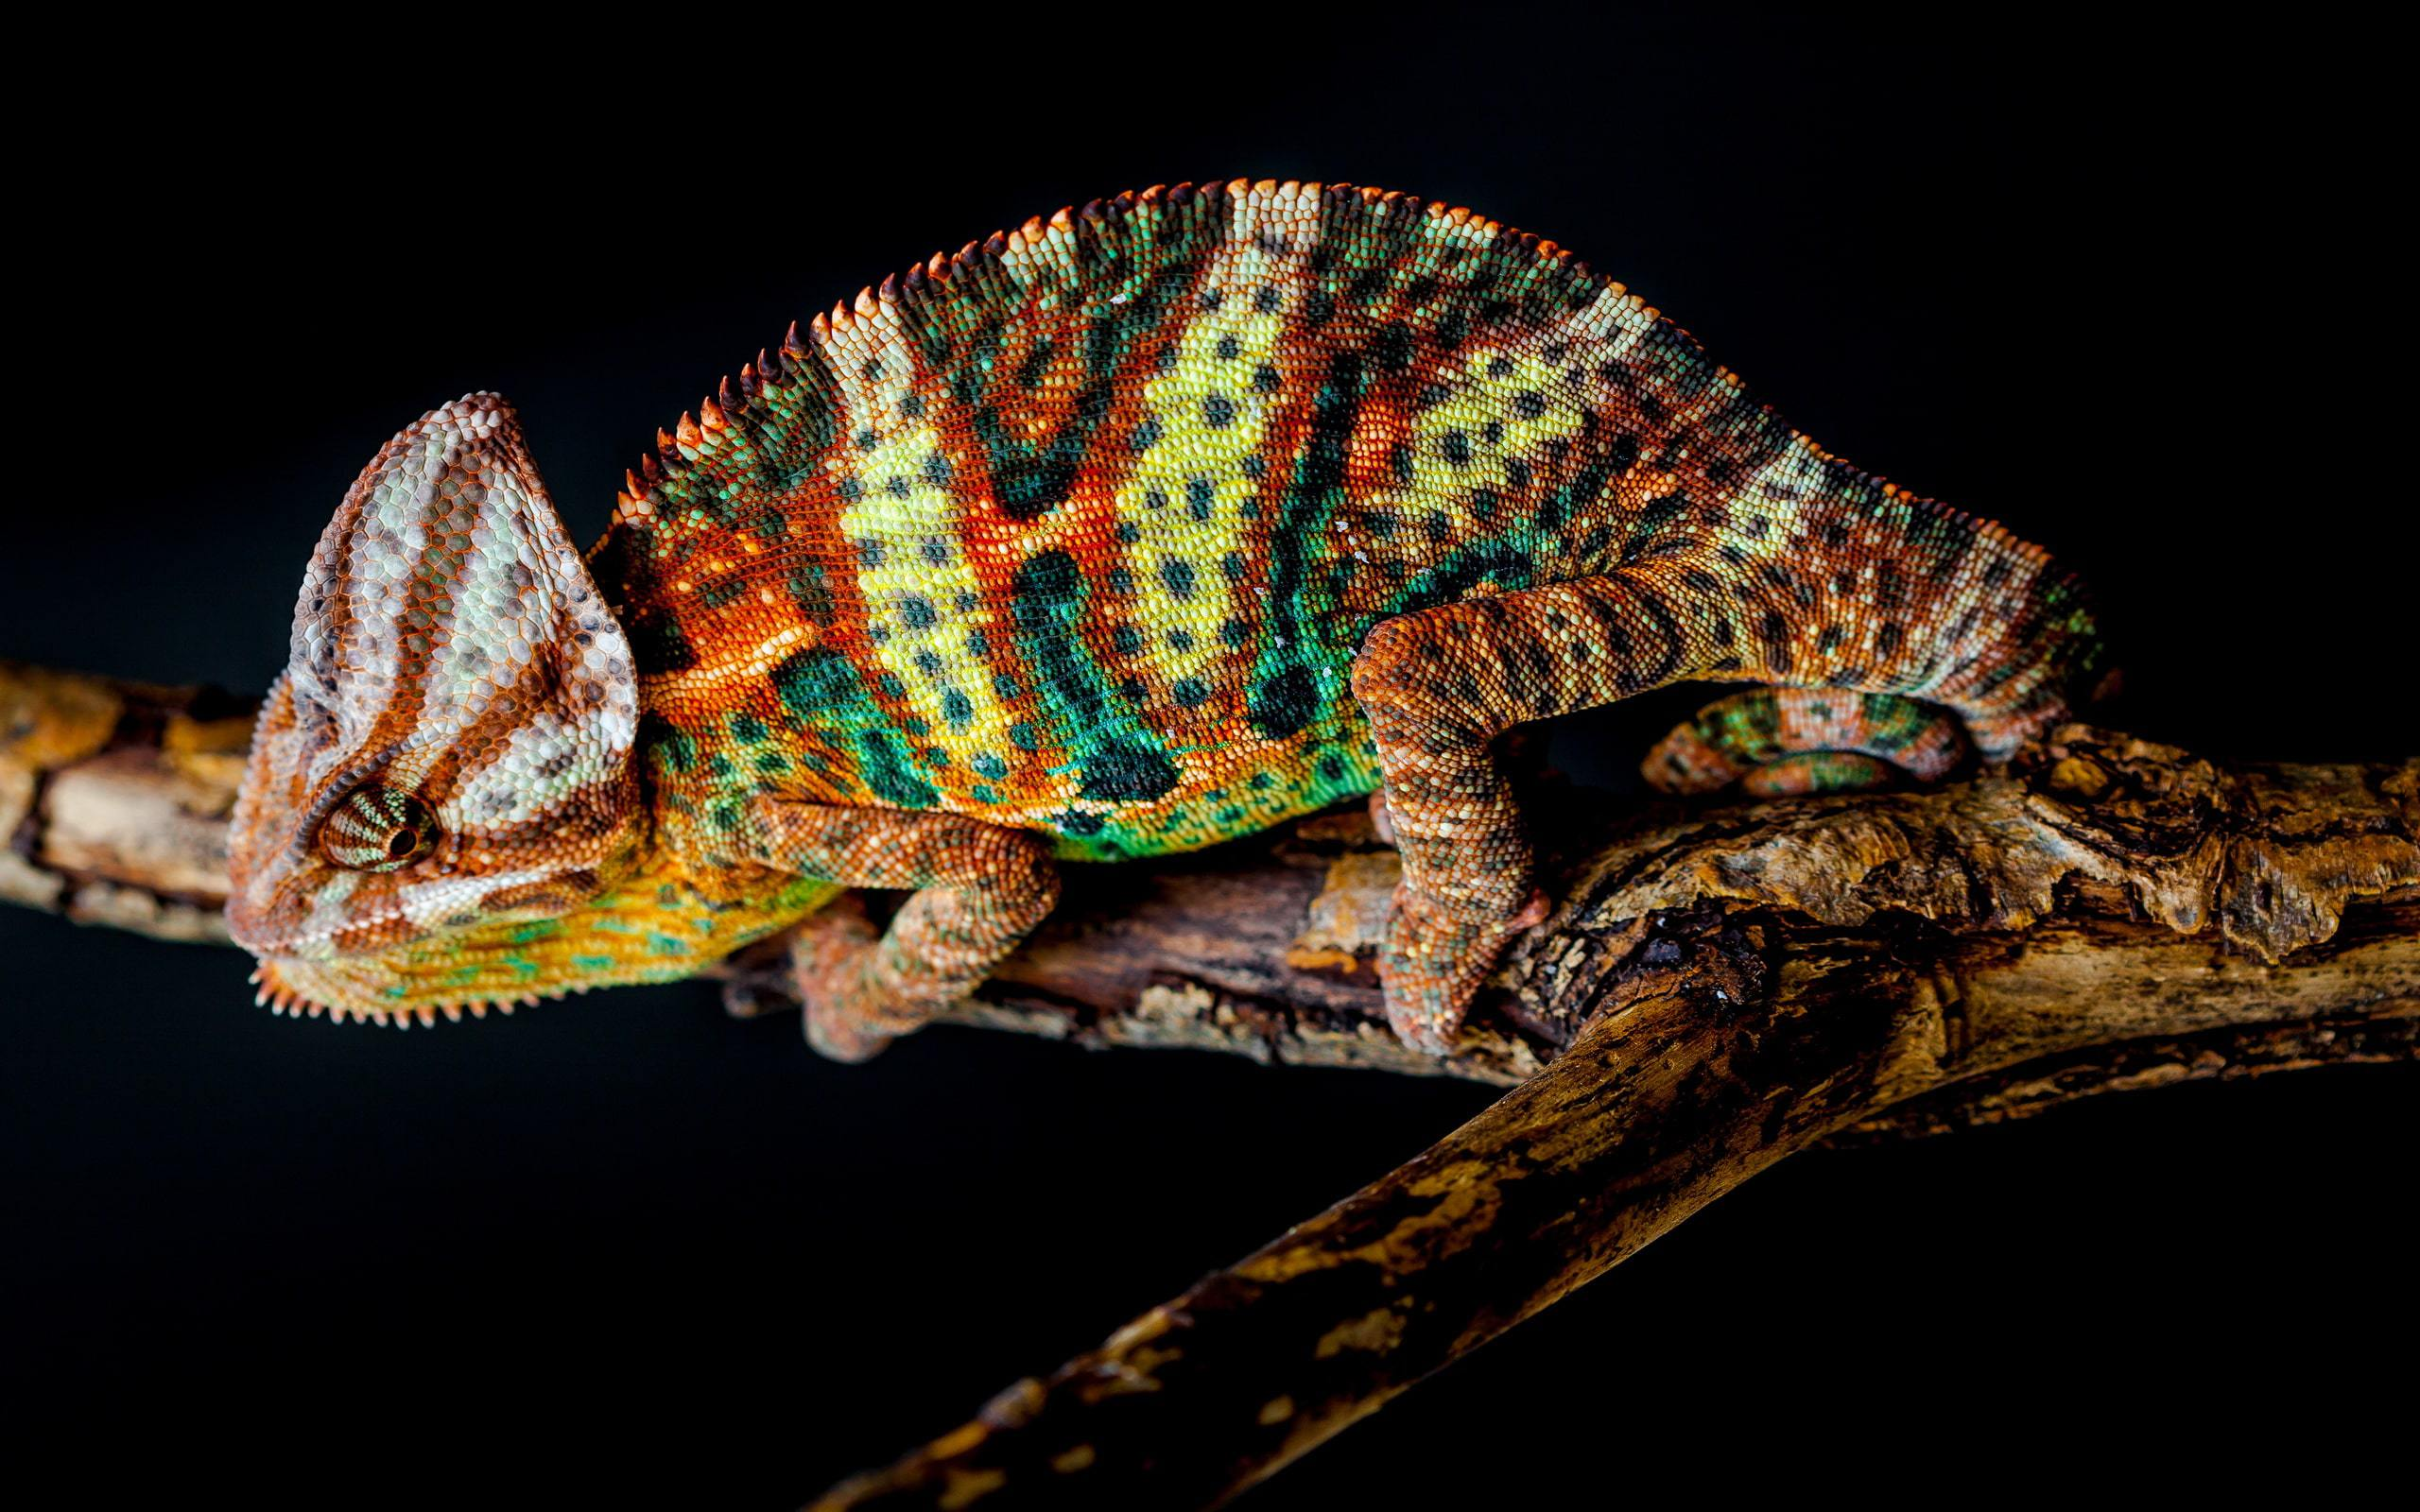 Chameleon Photos